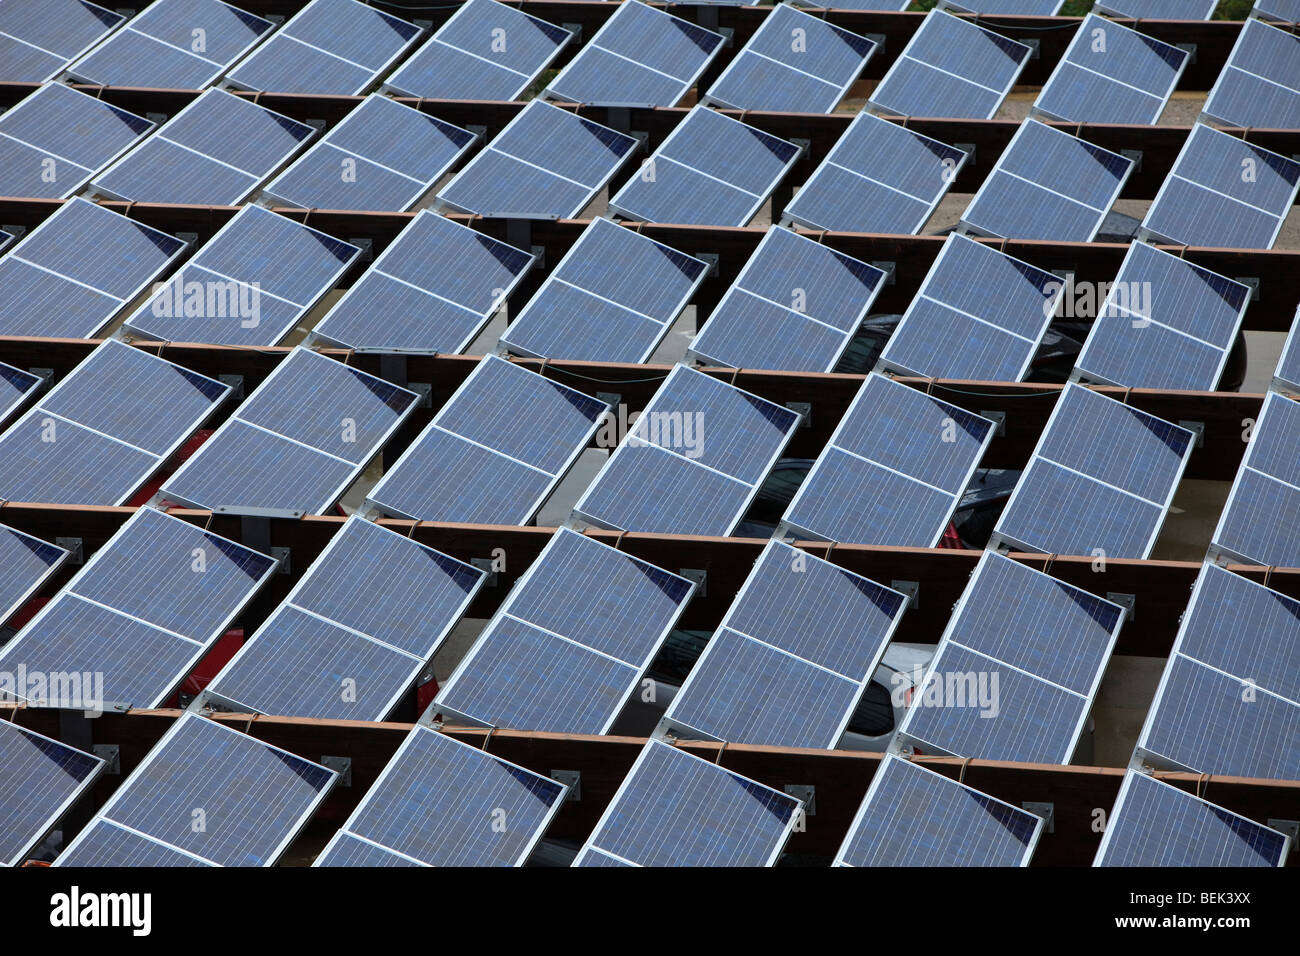 Matriz de paneles solares Imagen De Stock